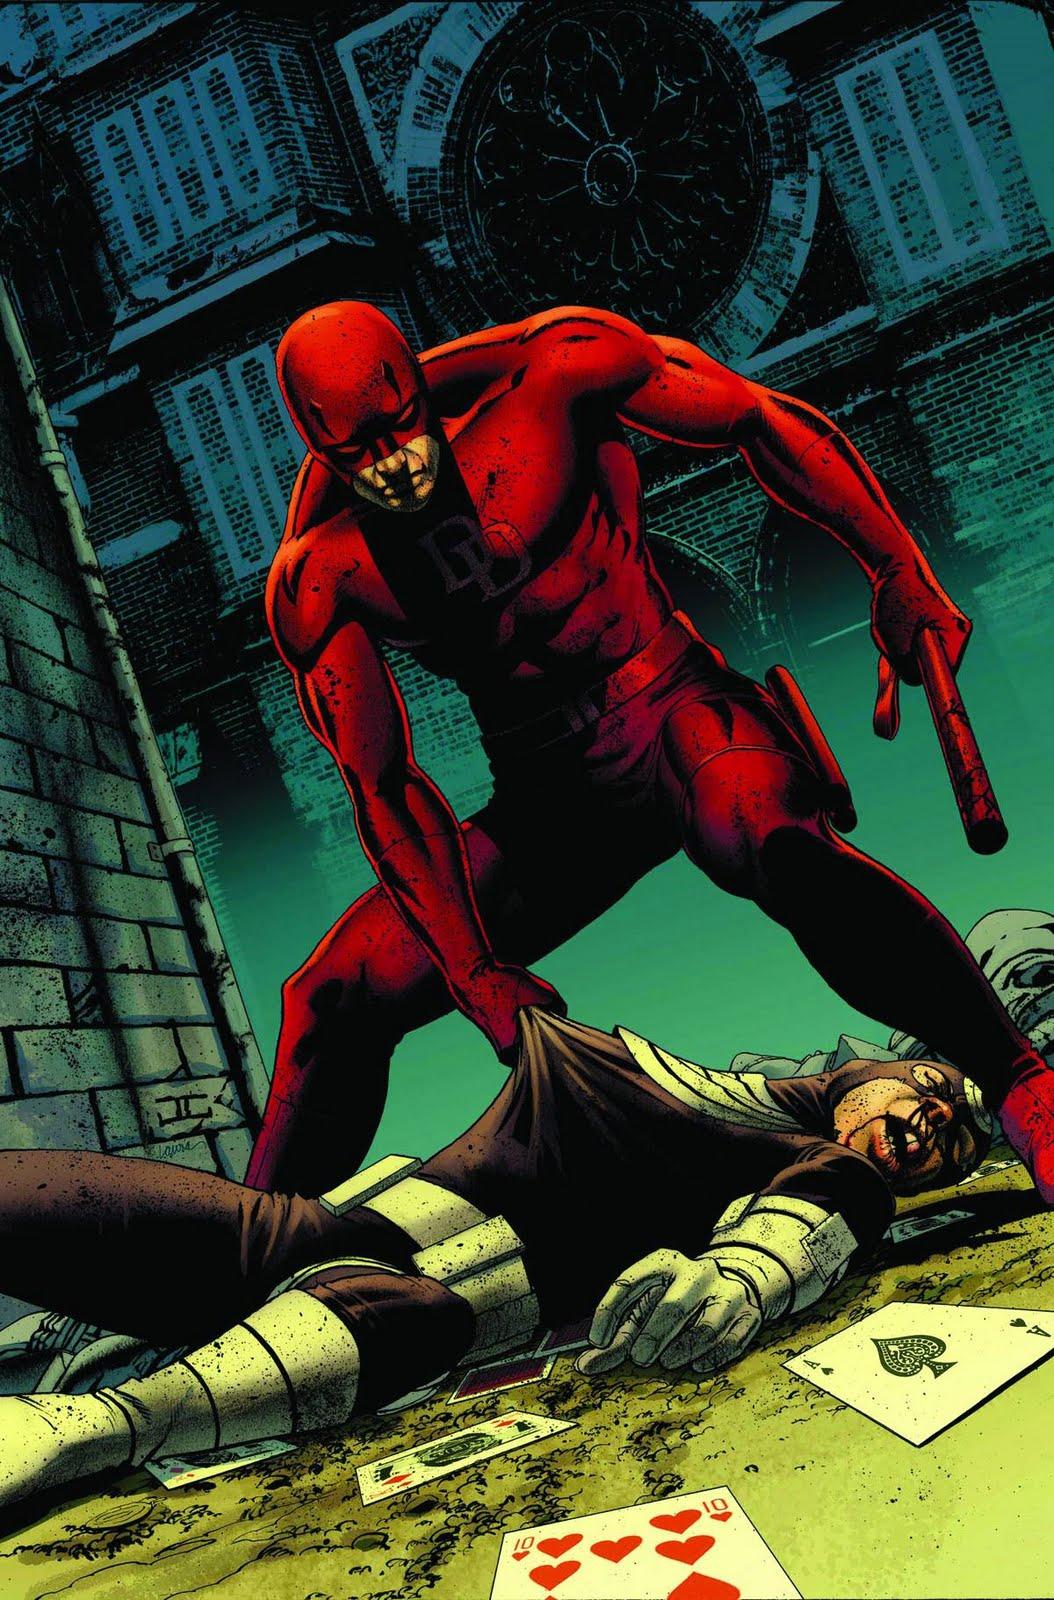 Daredevil Daredevil comic, Marvel daredevil, Comics